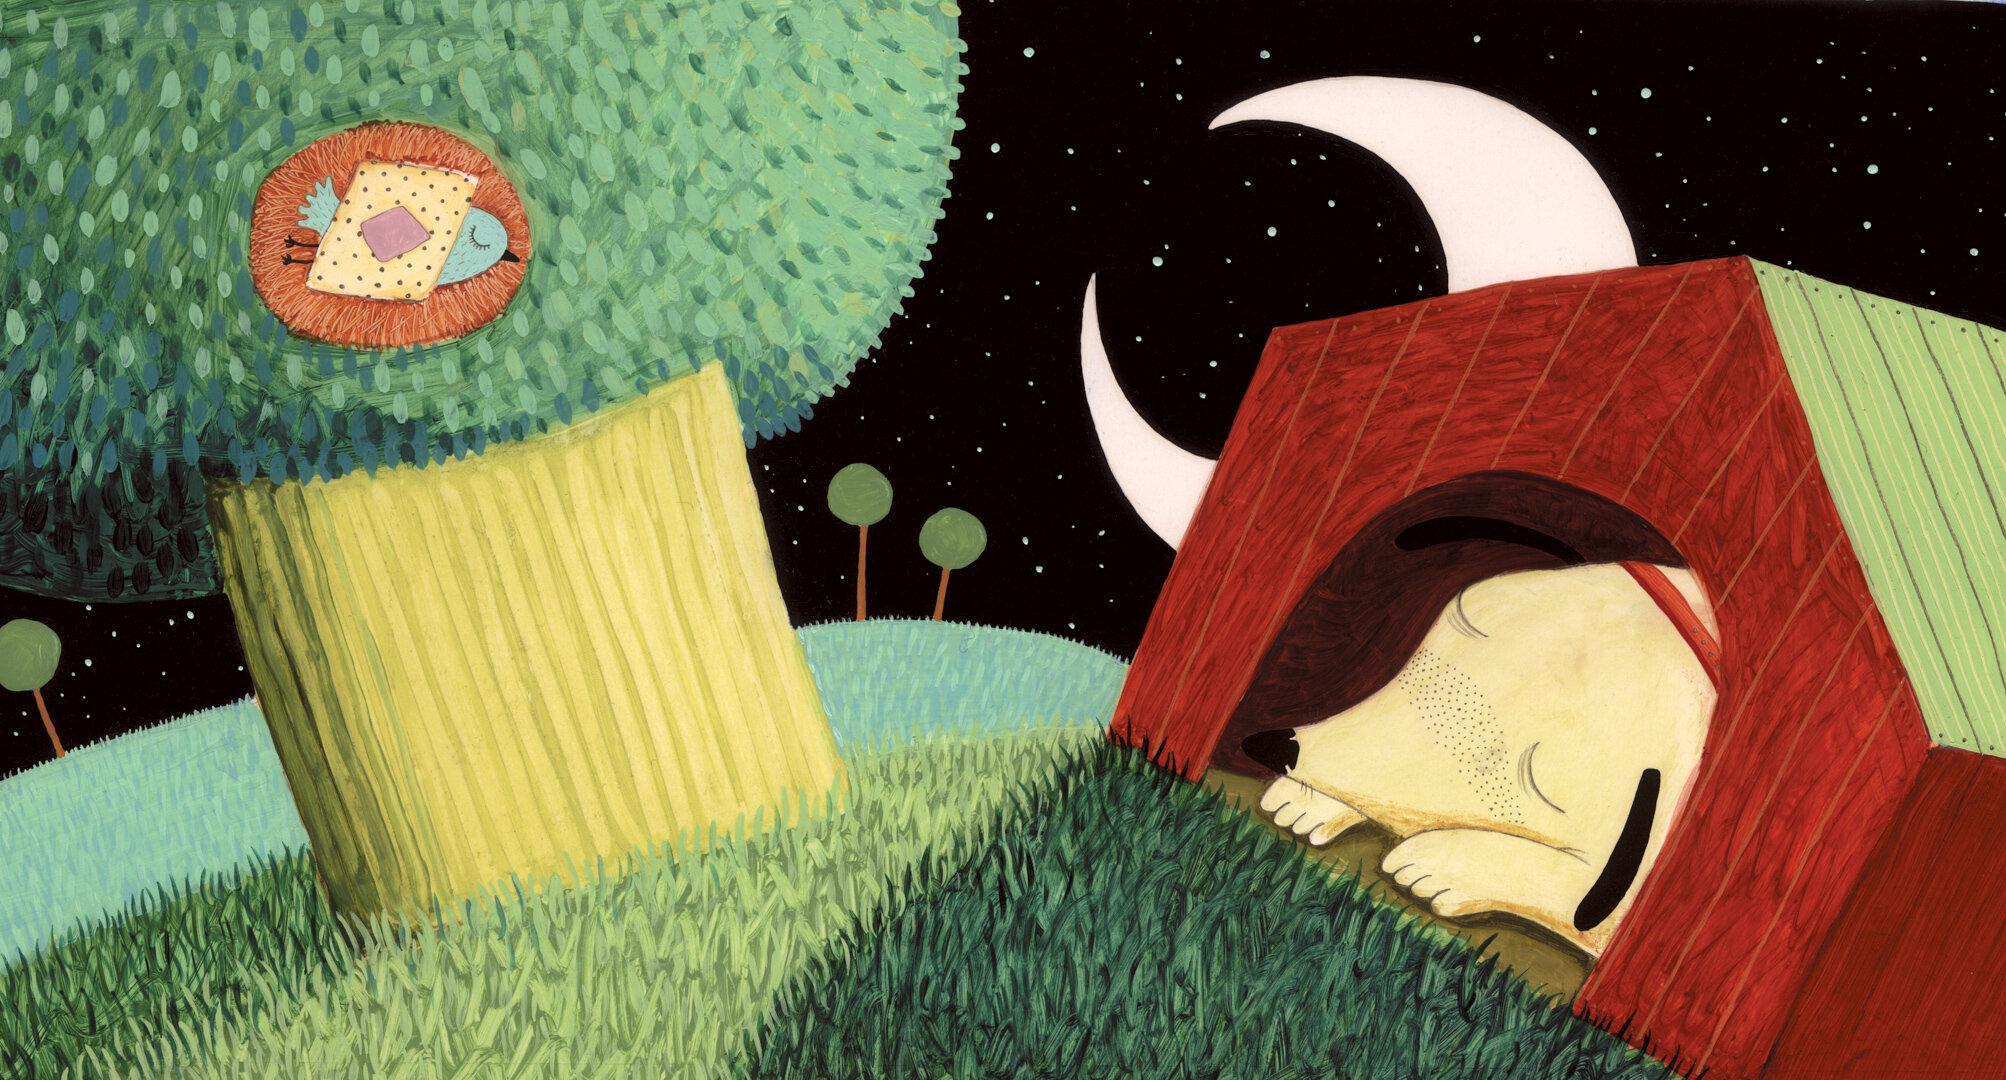 Where Birdie Lives - Childrens' Book